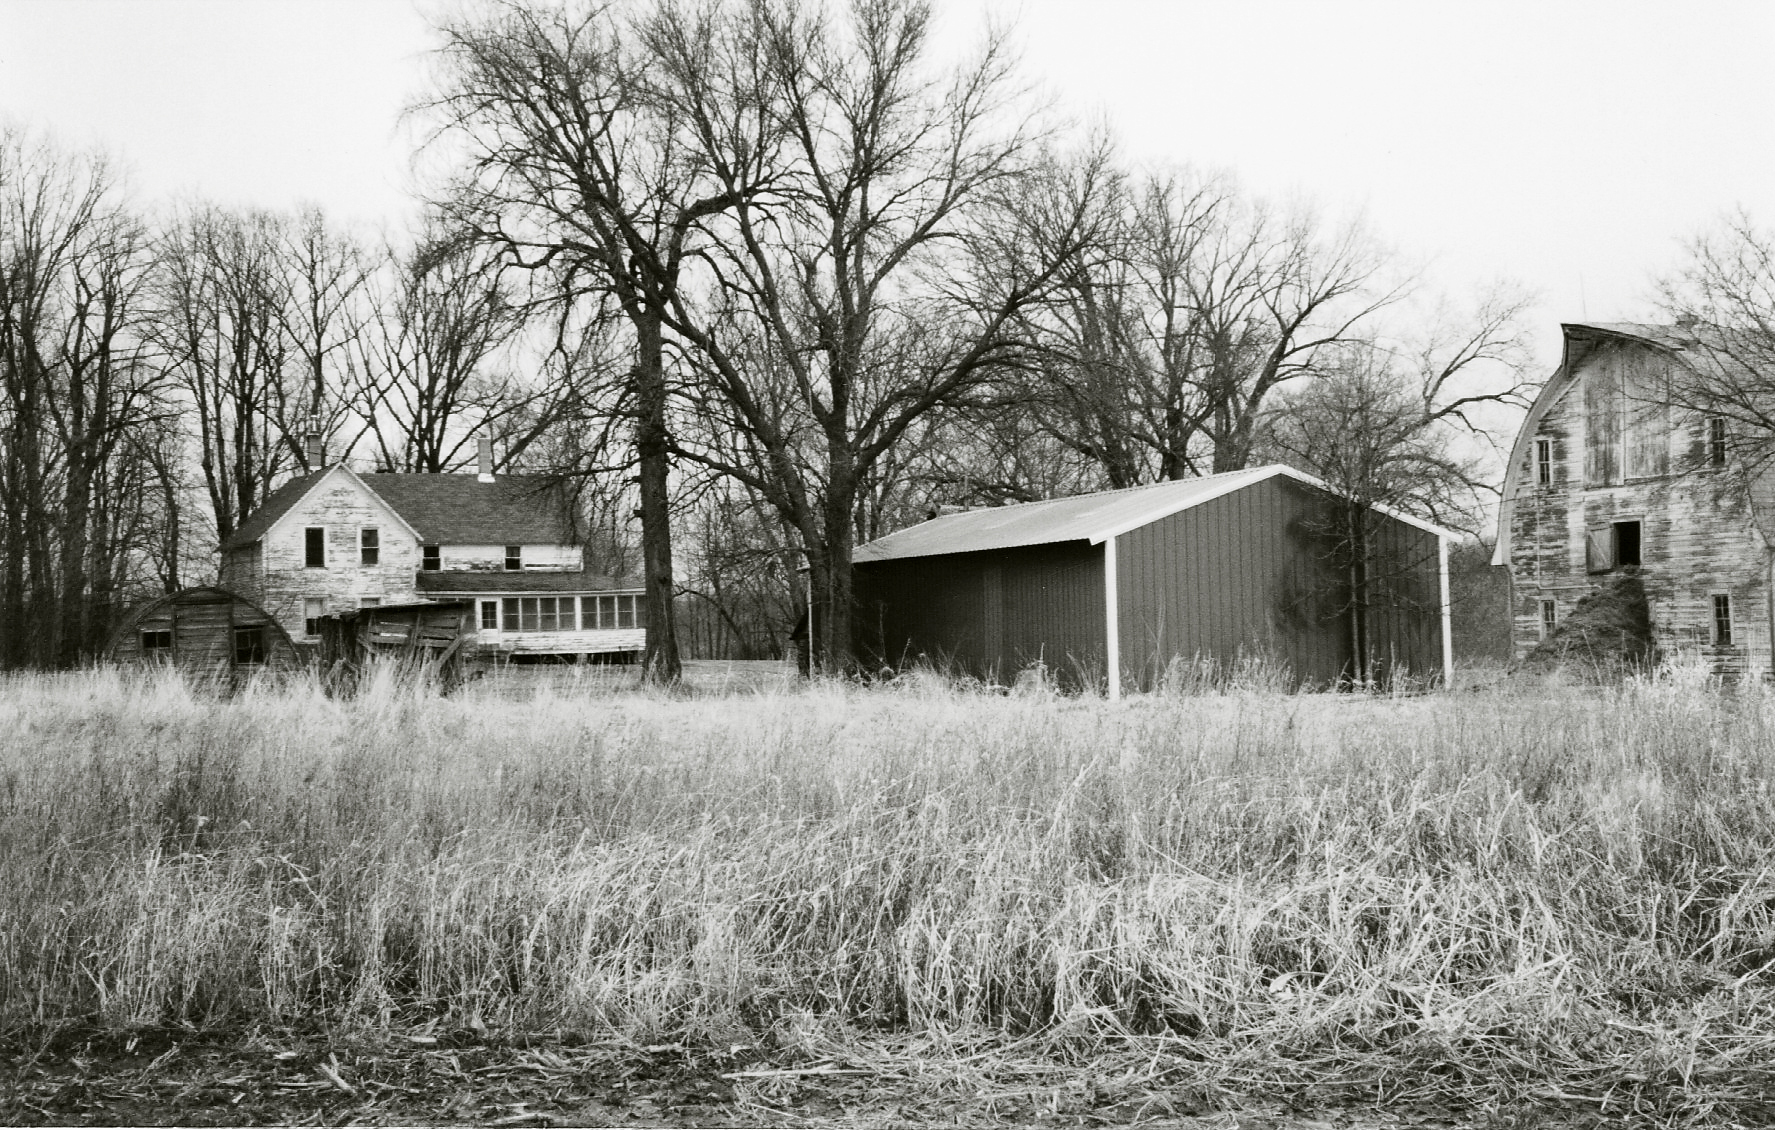 The Original Farm Just Two Farm Kids